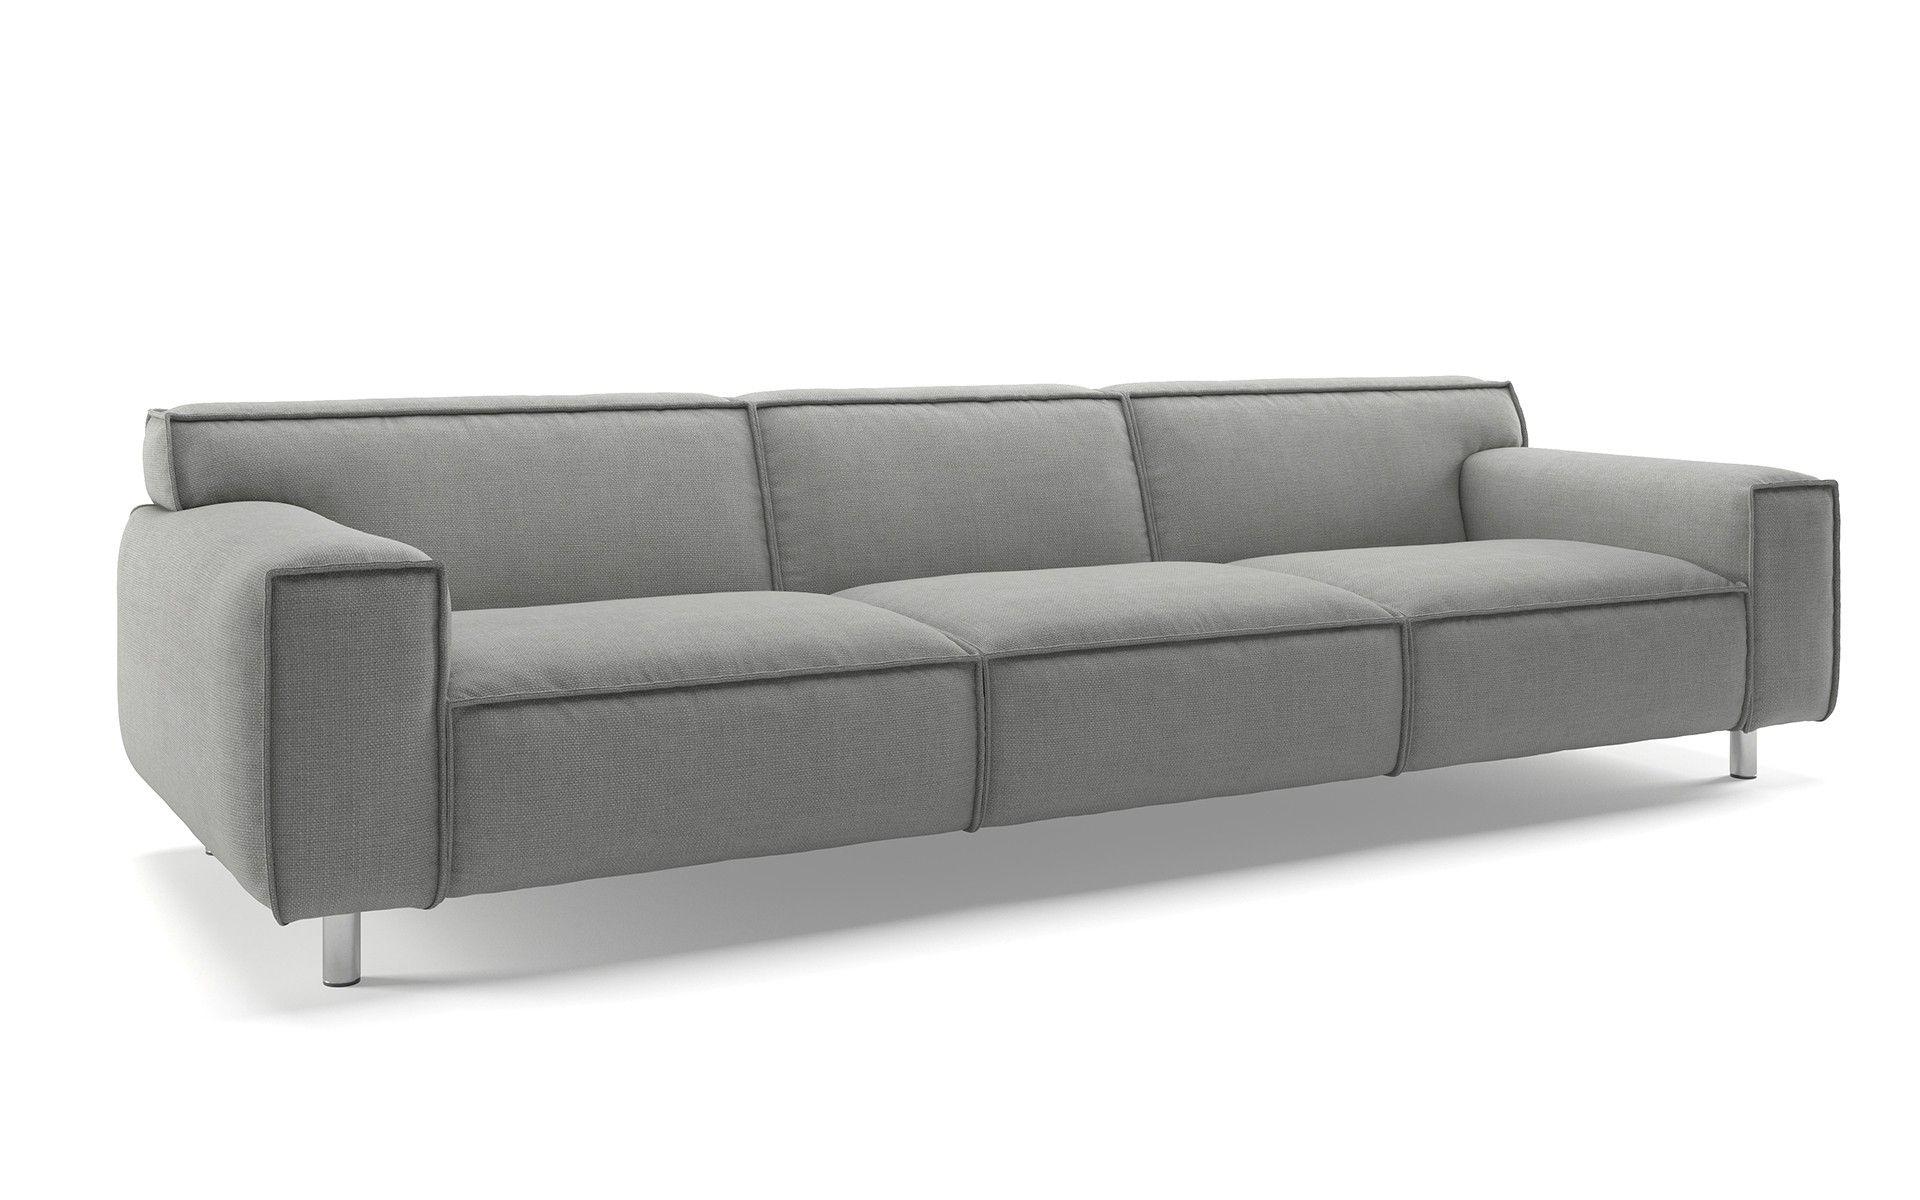 Full Size of Sofa 3 Sitzer Grau Leder Couch Ikea Louisiana (3 Sitzer Mit Polster Grau) 2 Und 3 Sitzer Nino Schwarz/grau Schlaffunktion 17 Genial Home Affaire Big Kare Sofa Sofa 3 Sitzer Grau